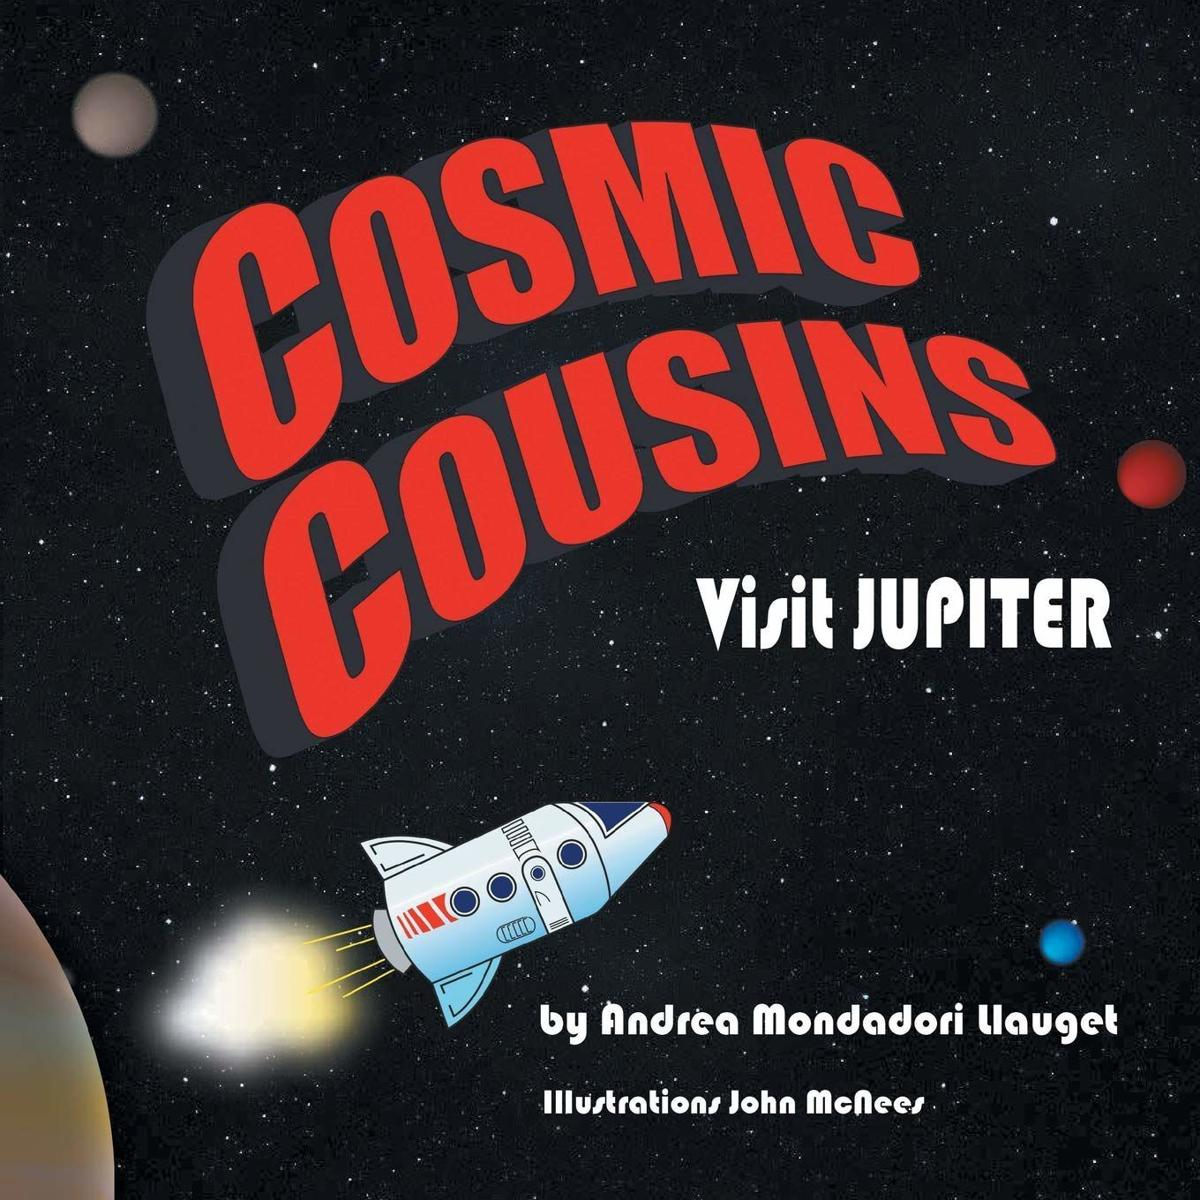 'Cosmic Cousins Visit Jupiter'